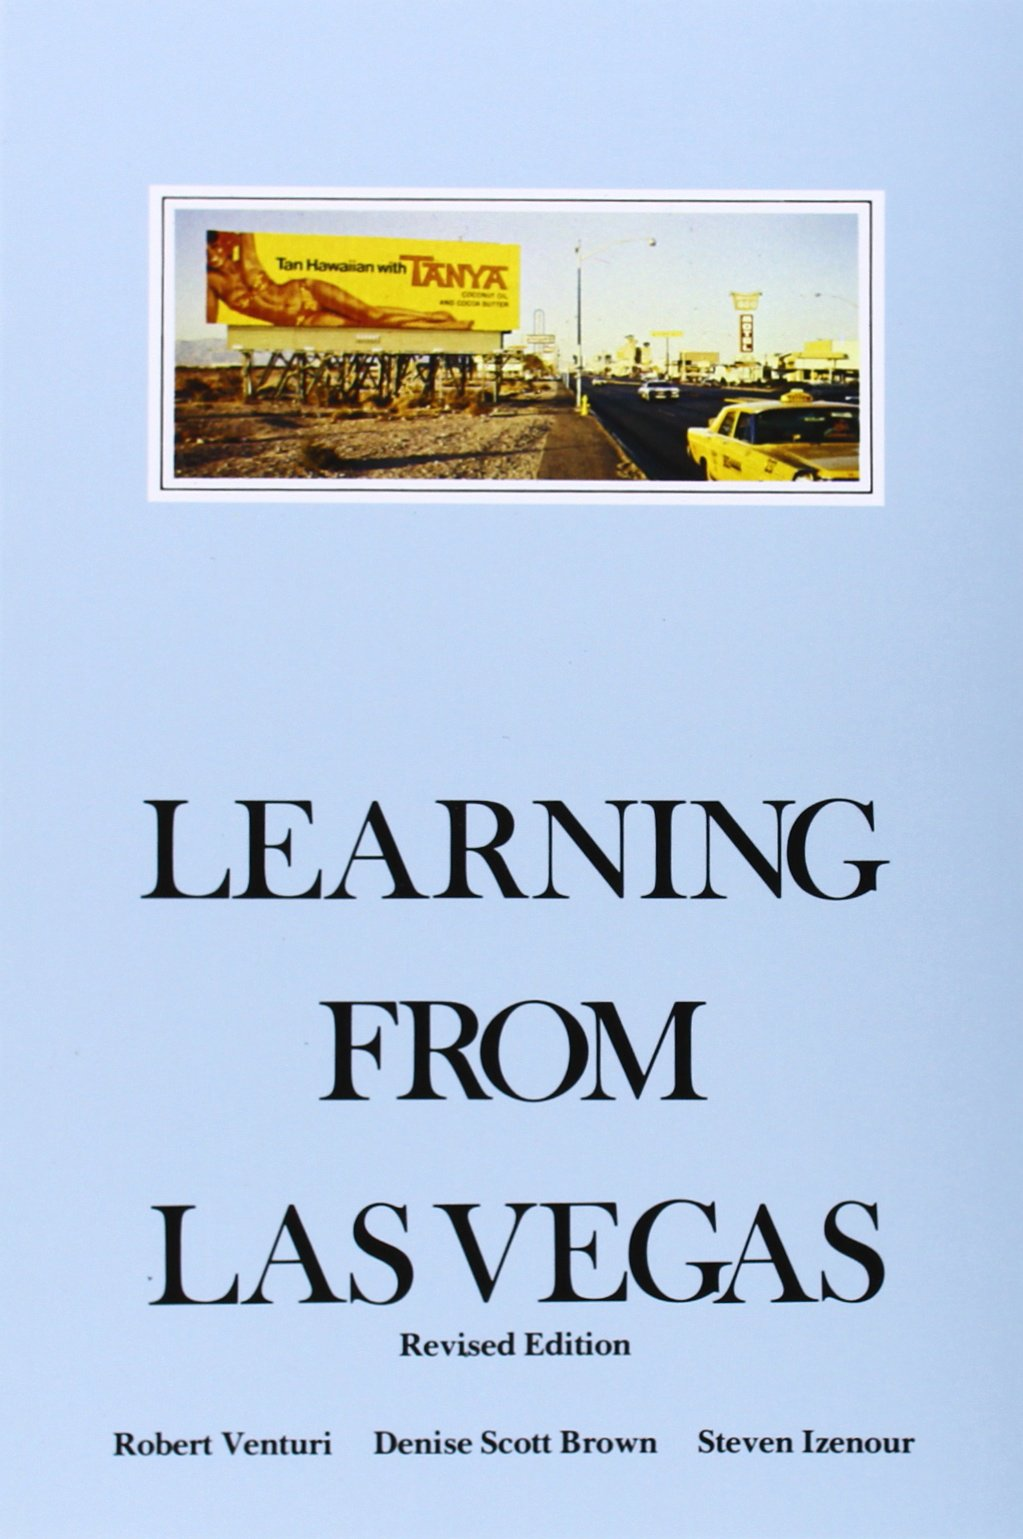 Learning from Las Vegas Rev Ed ISBN-13 9780262720069